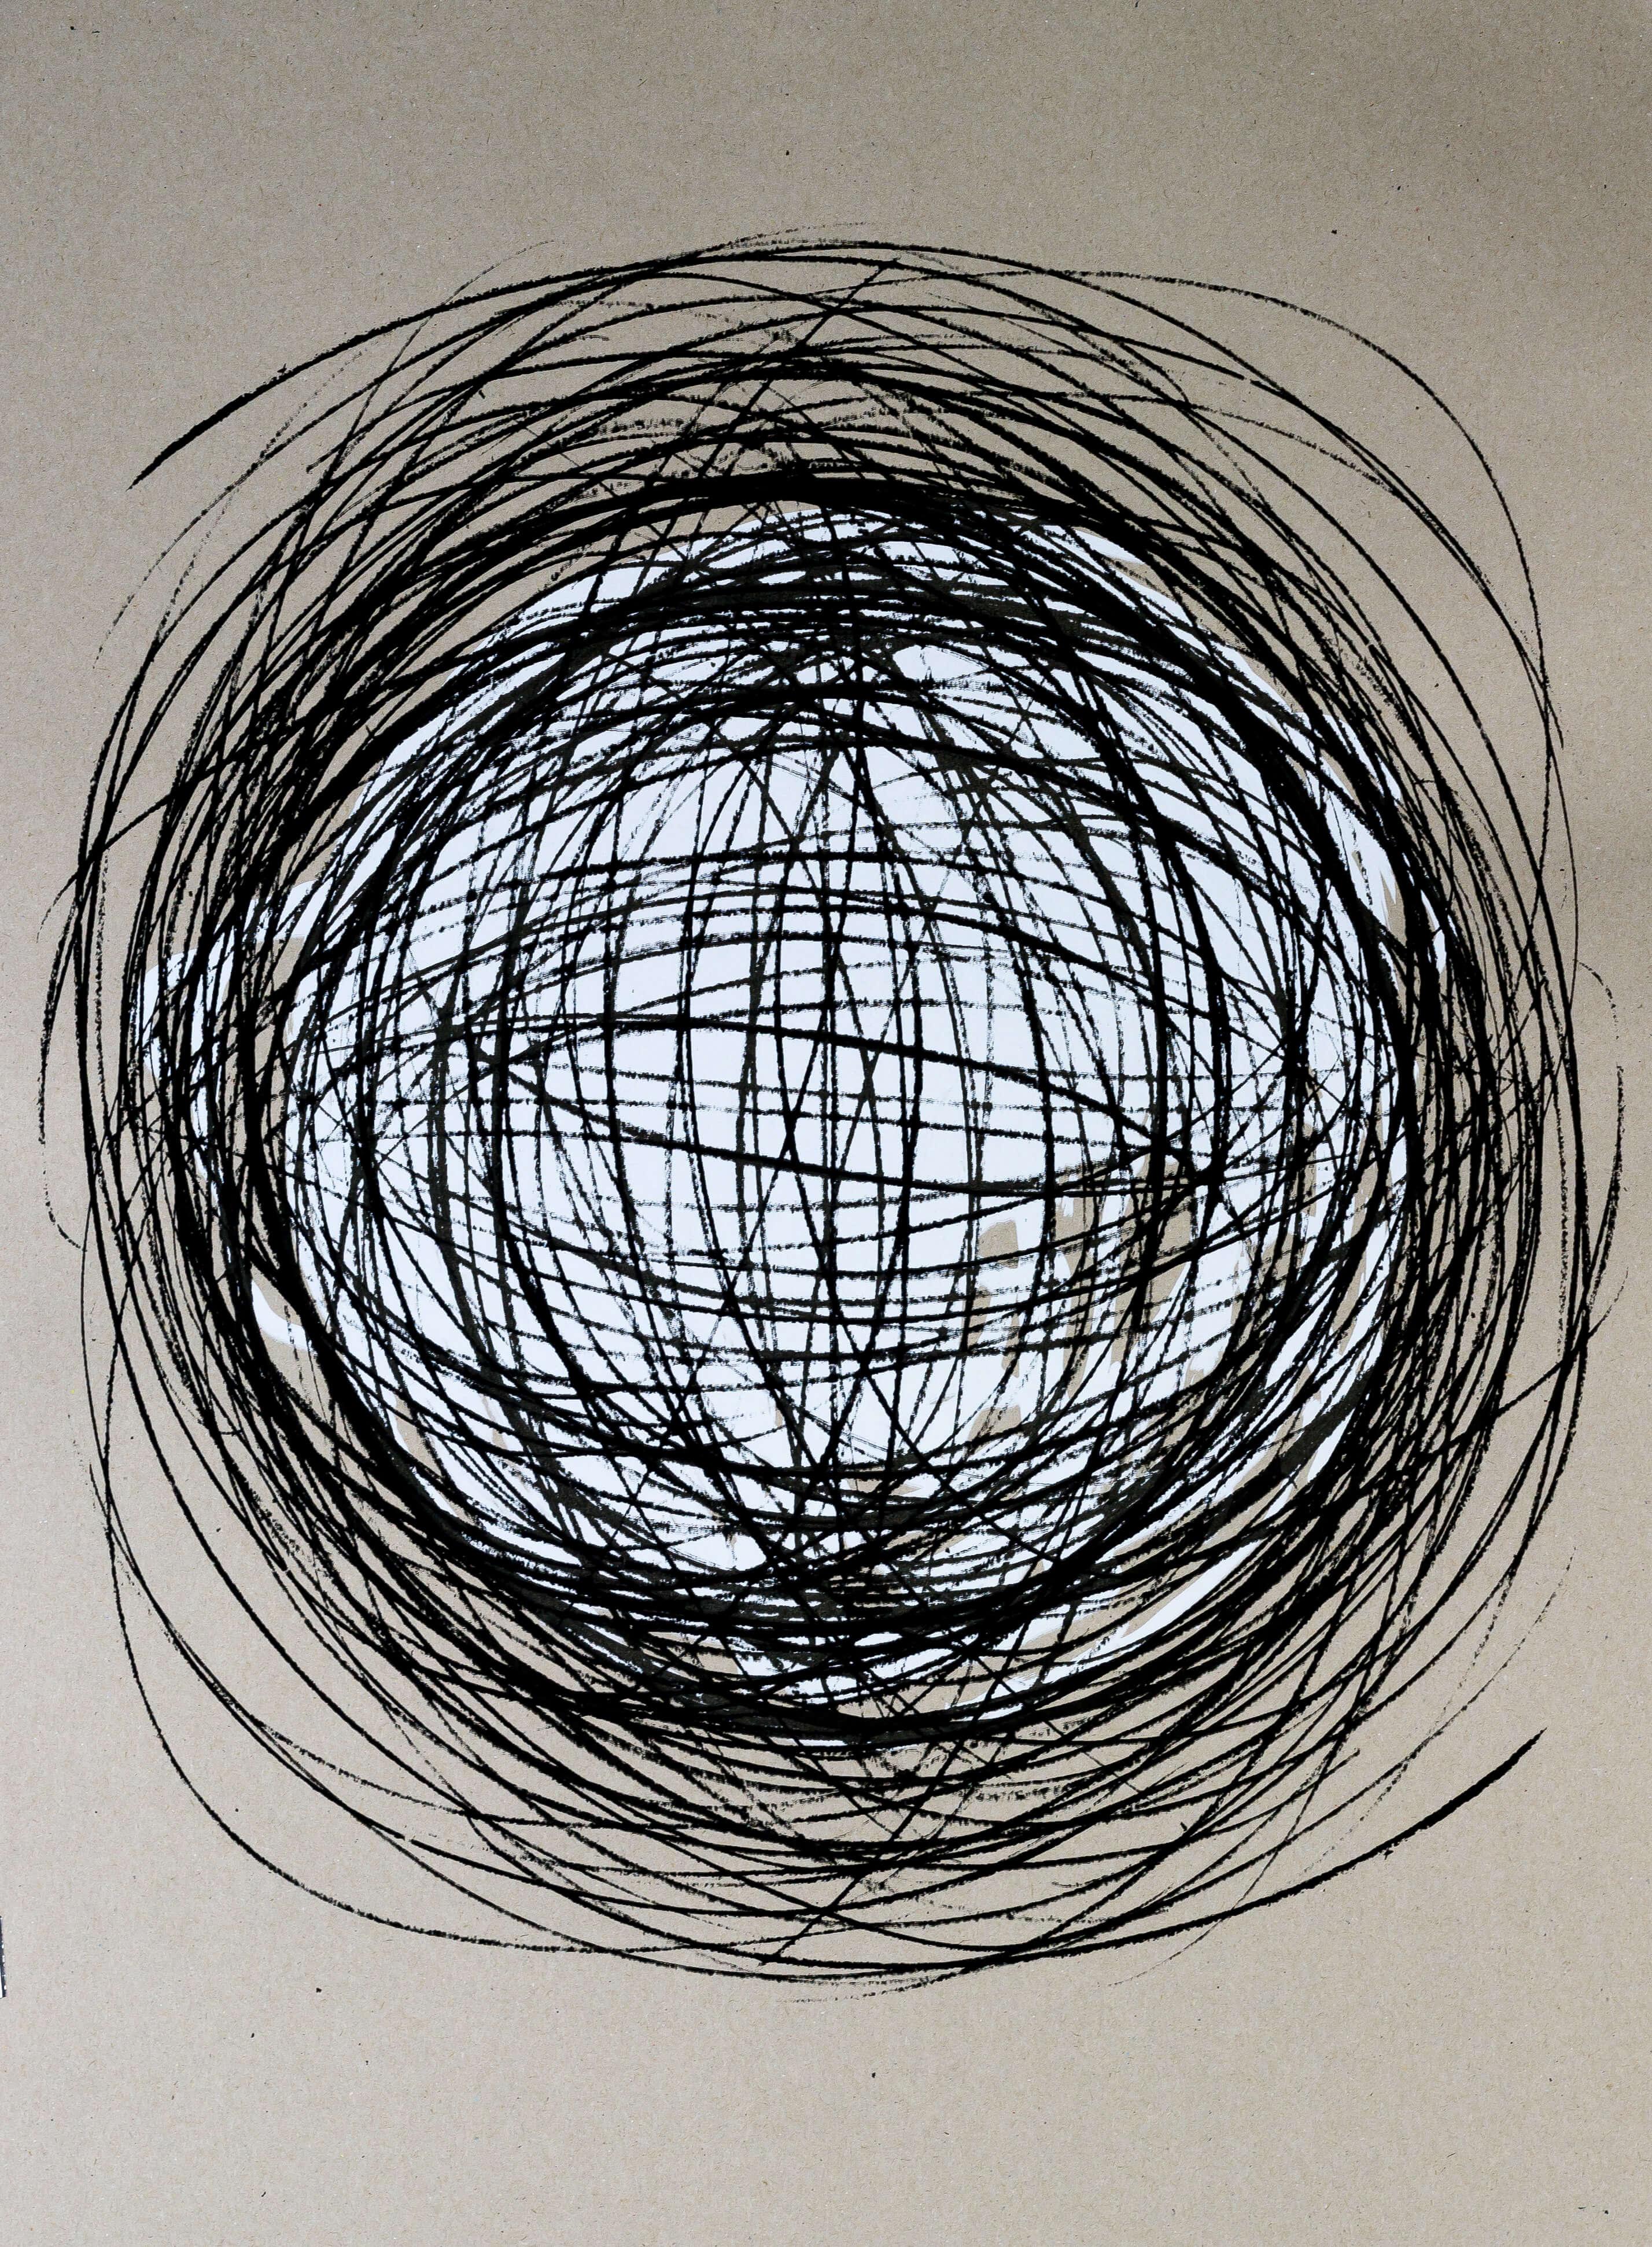 Katharina Albers, Transformation XXVIII, 2011, Siebdruck, Unikat, 59,5x42cm